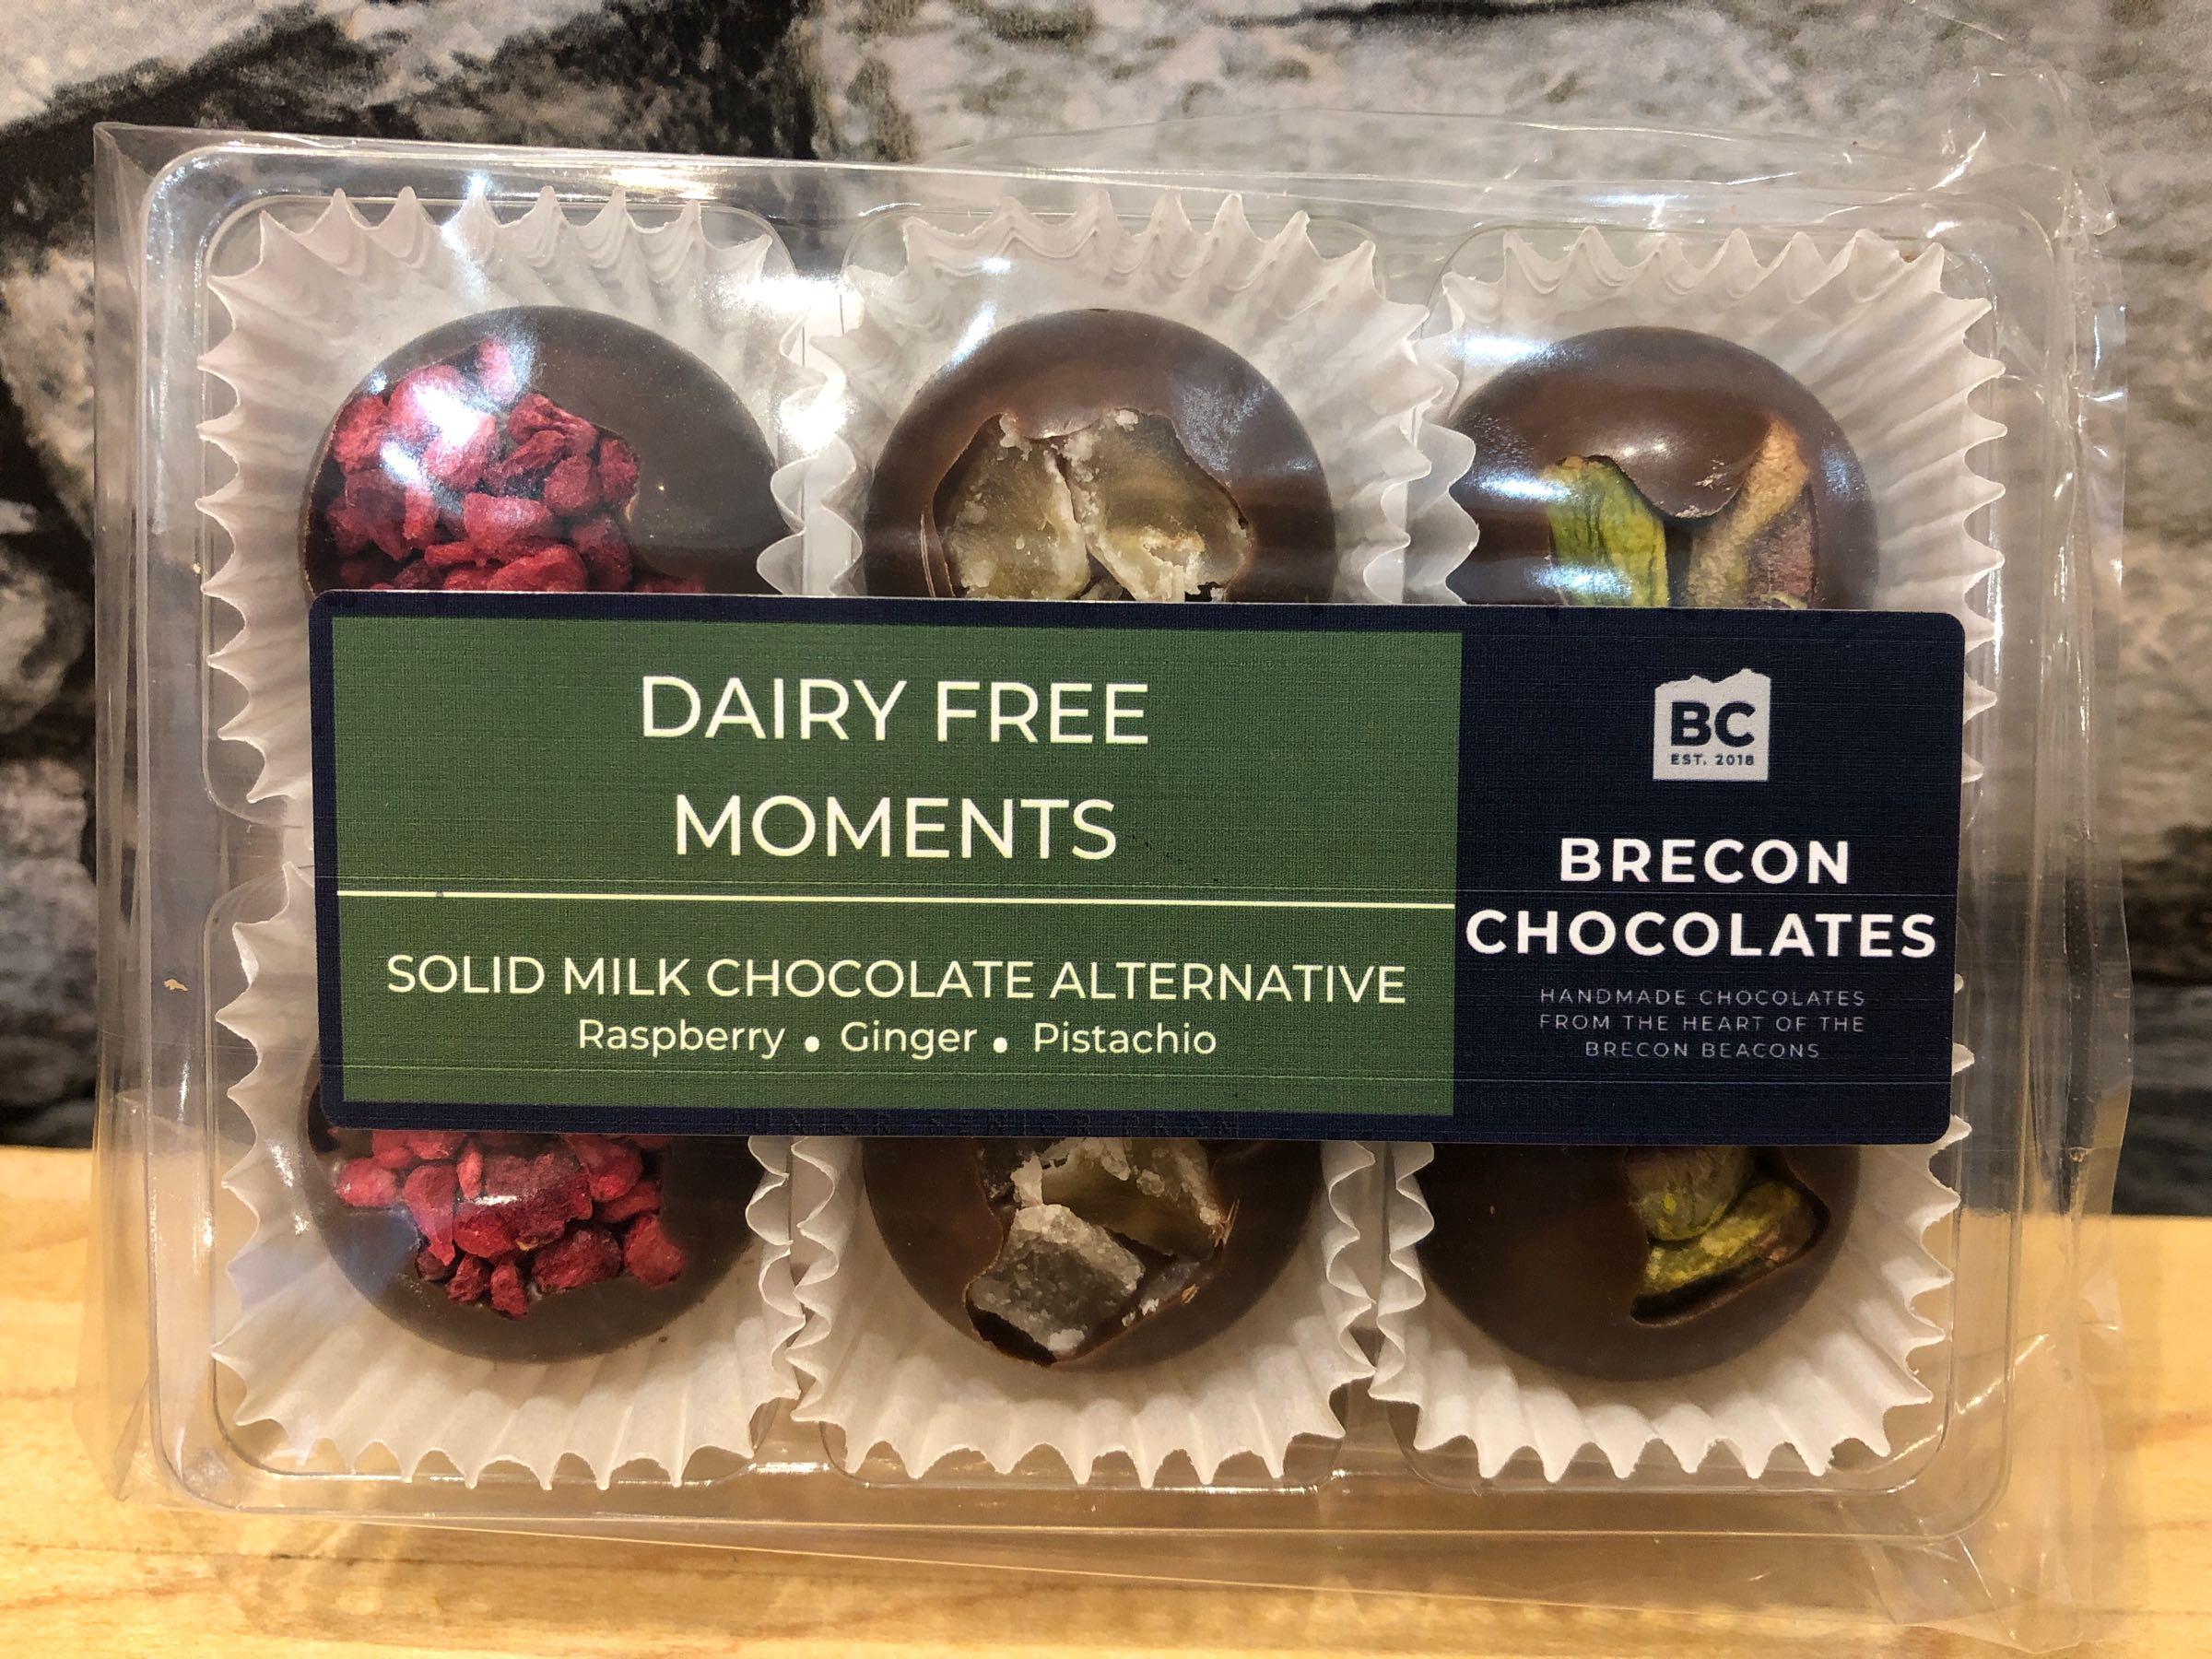 Dairy Free Milk Chocolate Alternative Moments